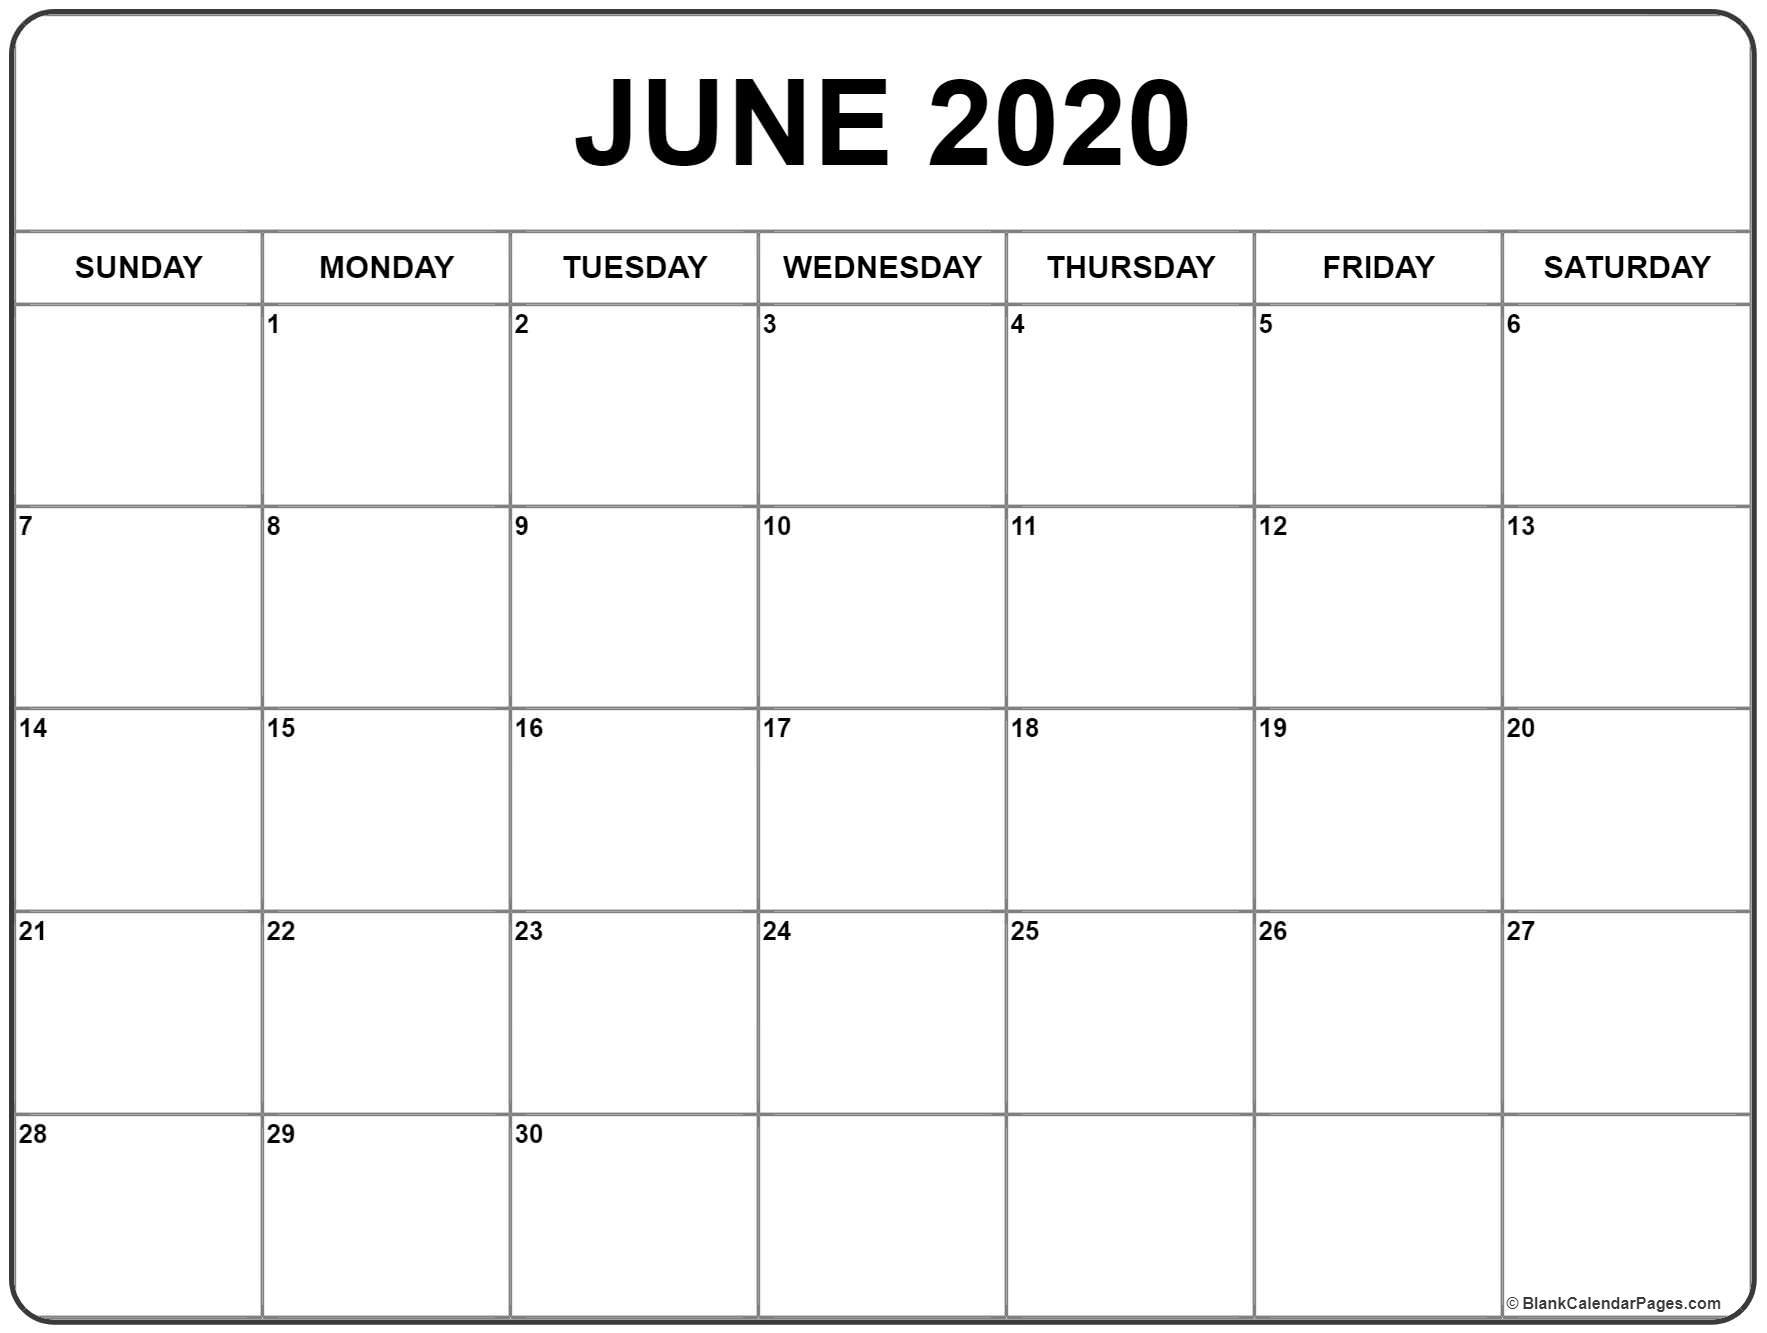 June 2020 Calendar | Free Printable Monthly Calendars regarding Year-Long Calendar 2020 Printable